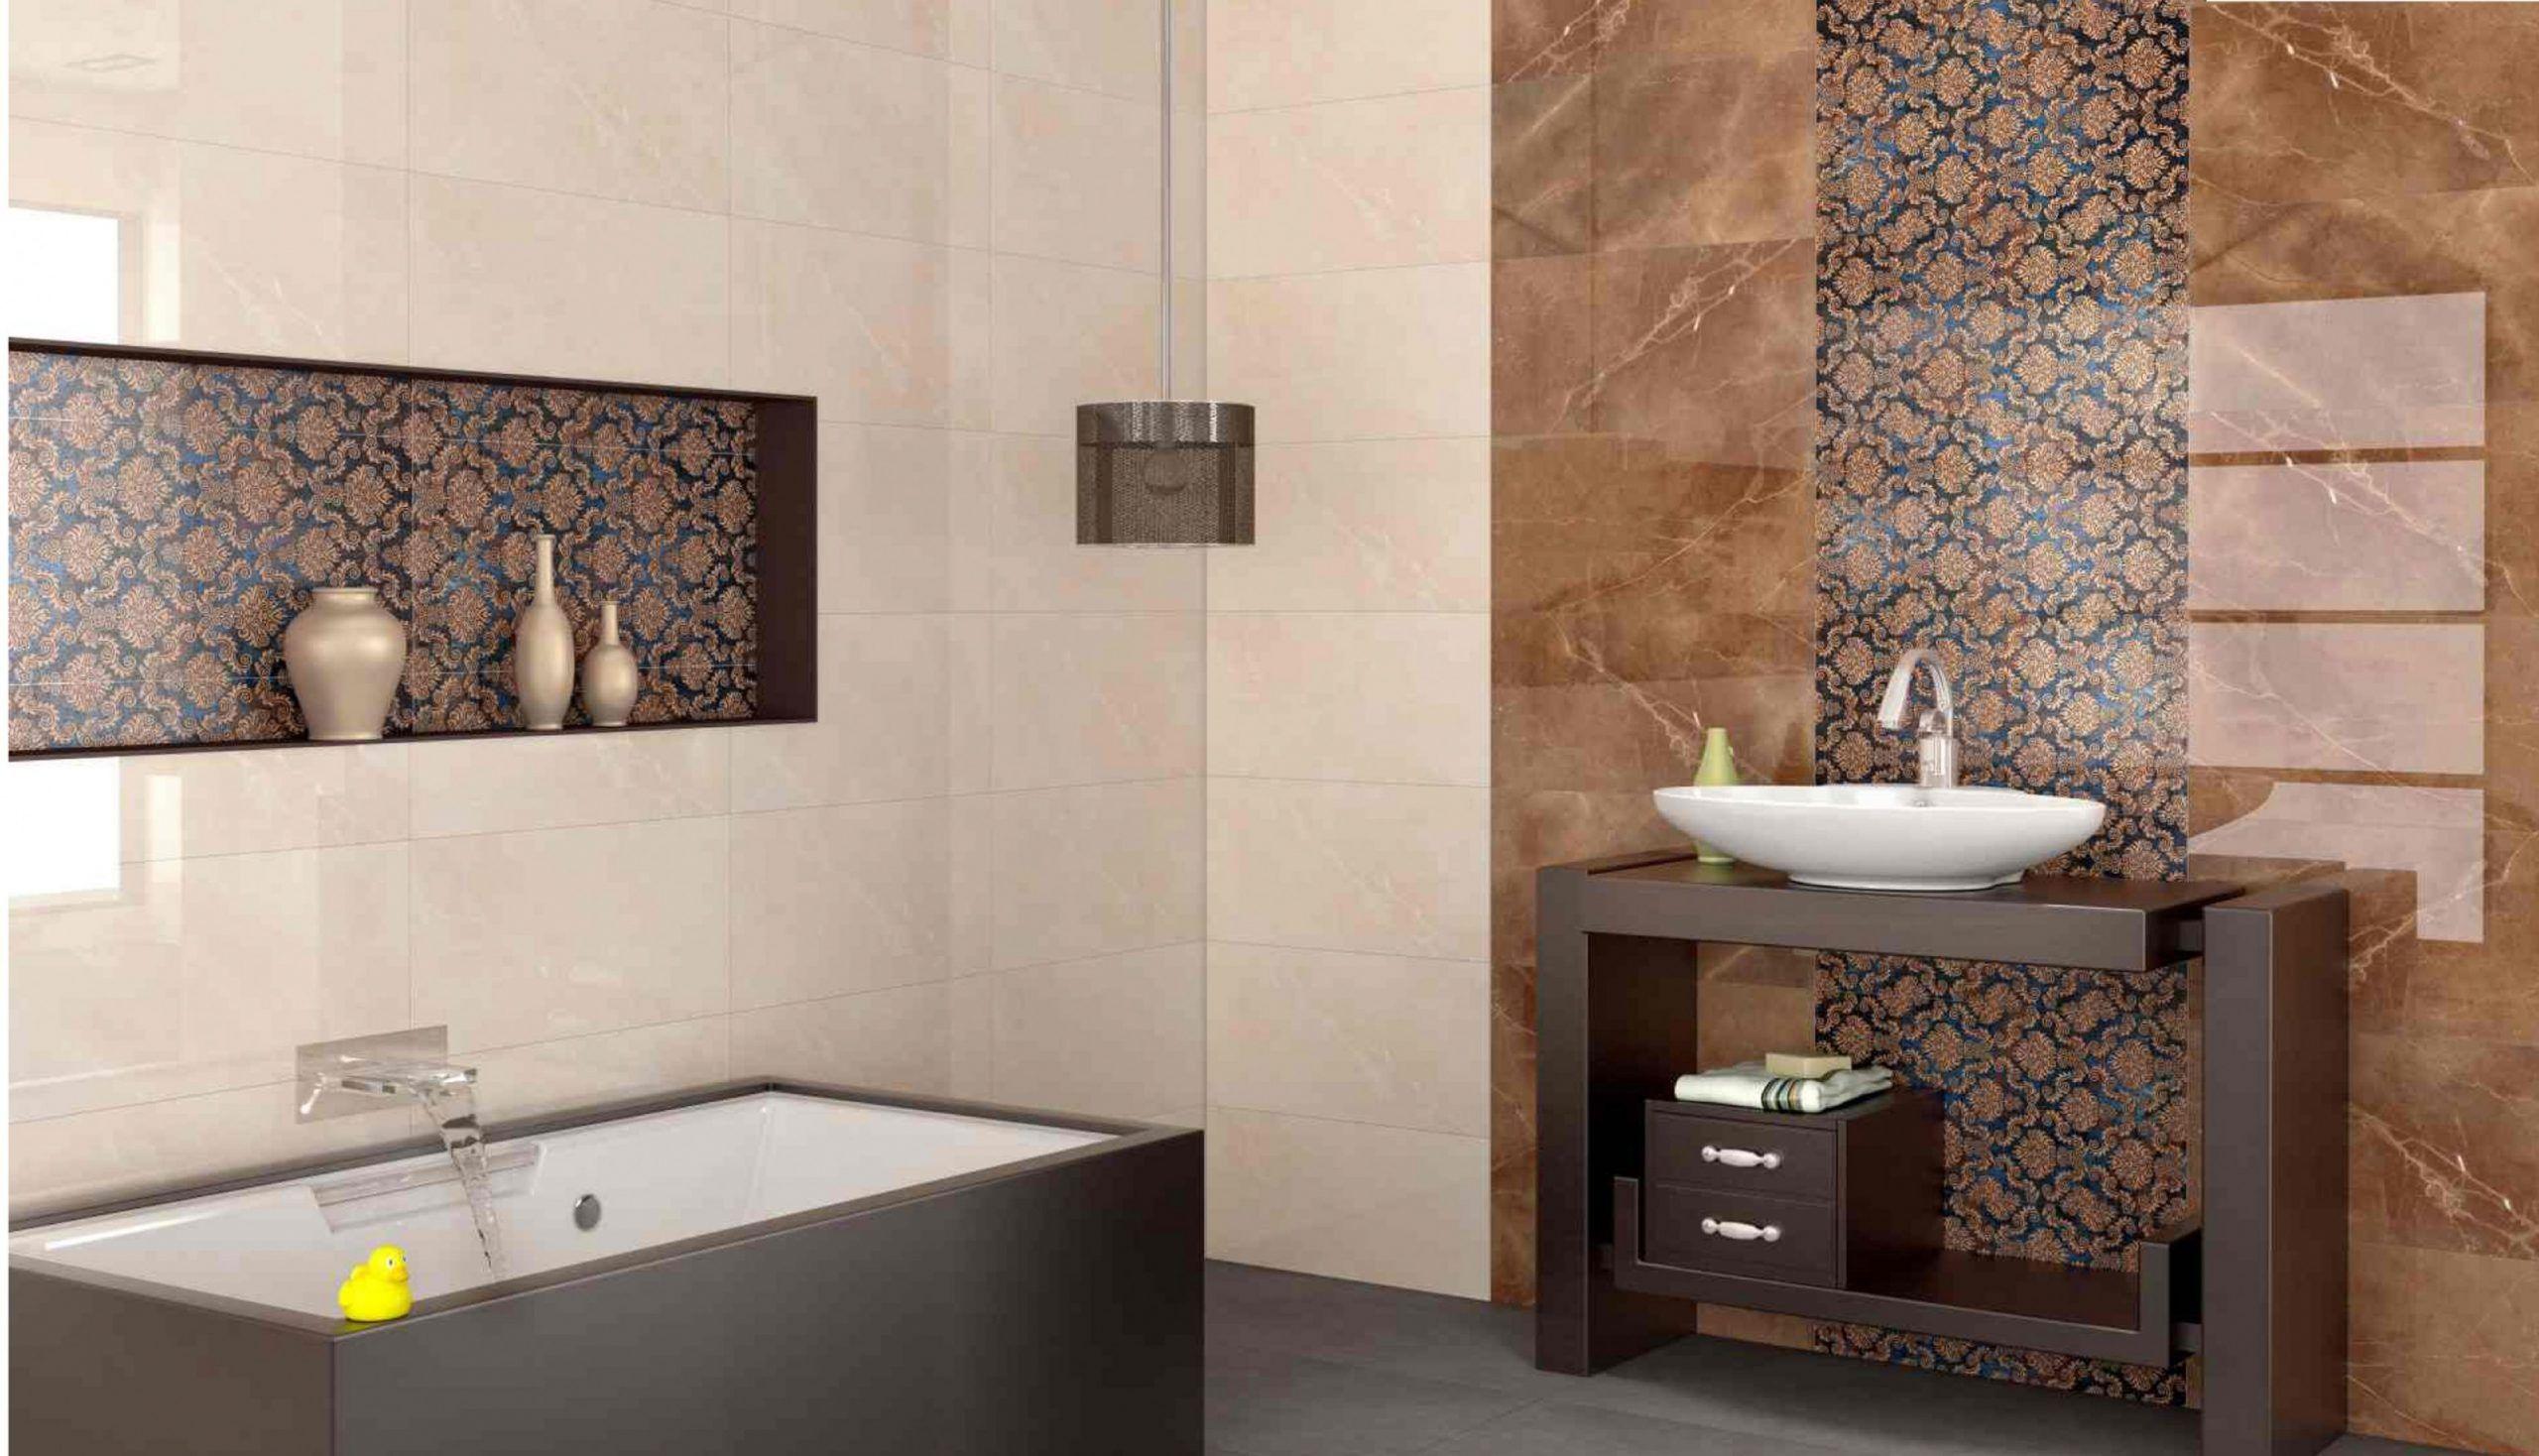 Indian Bathroom Wall Tiles Design Di 2020